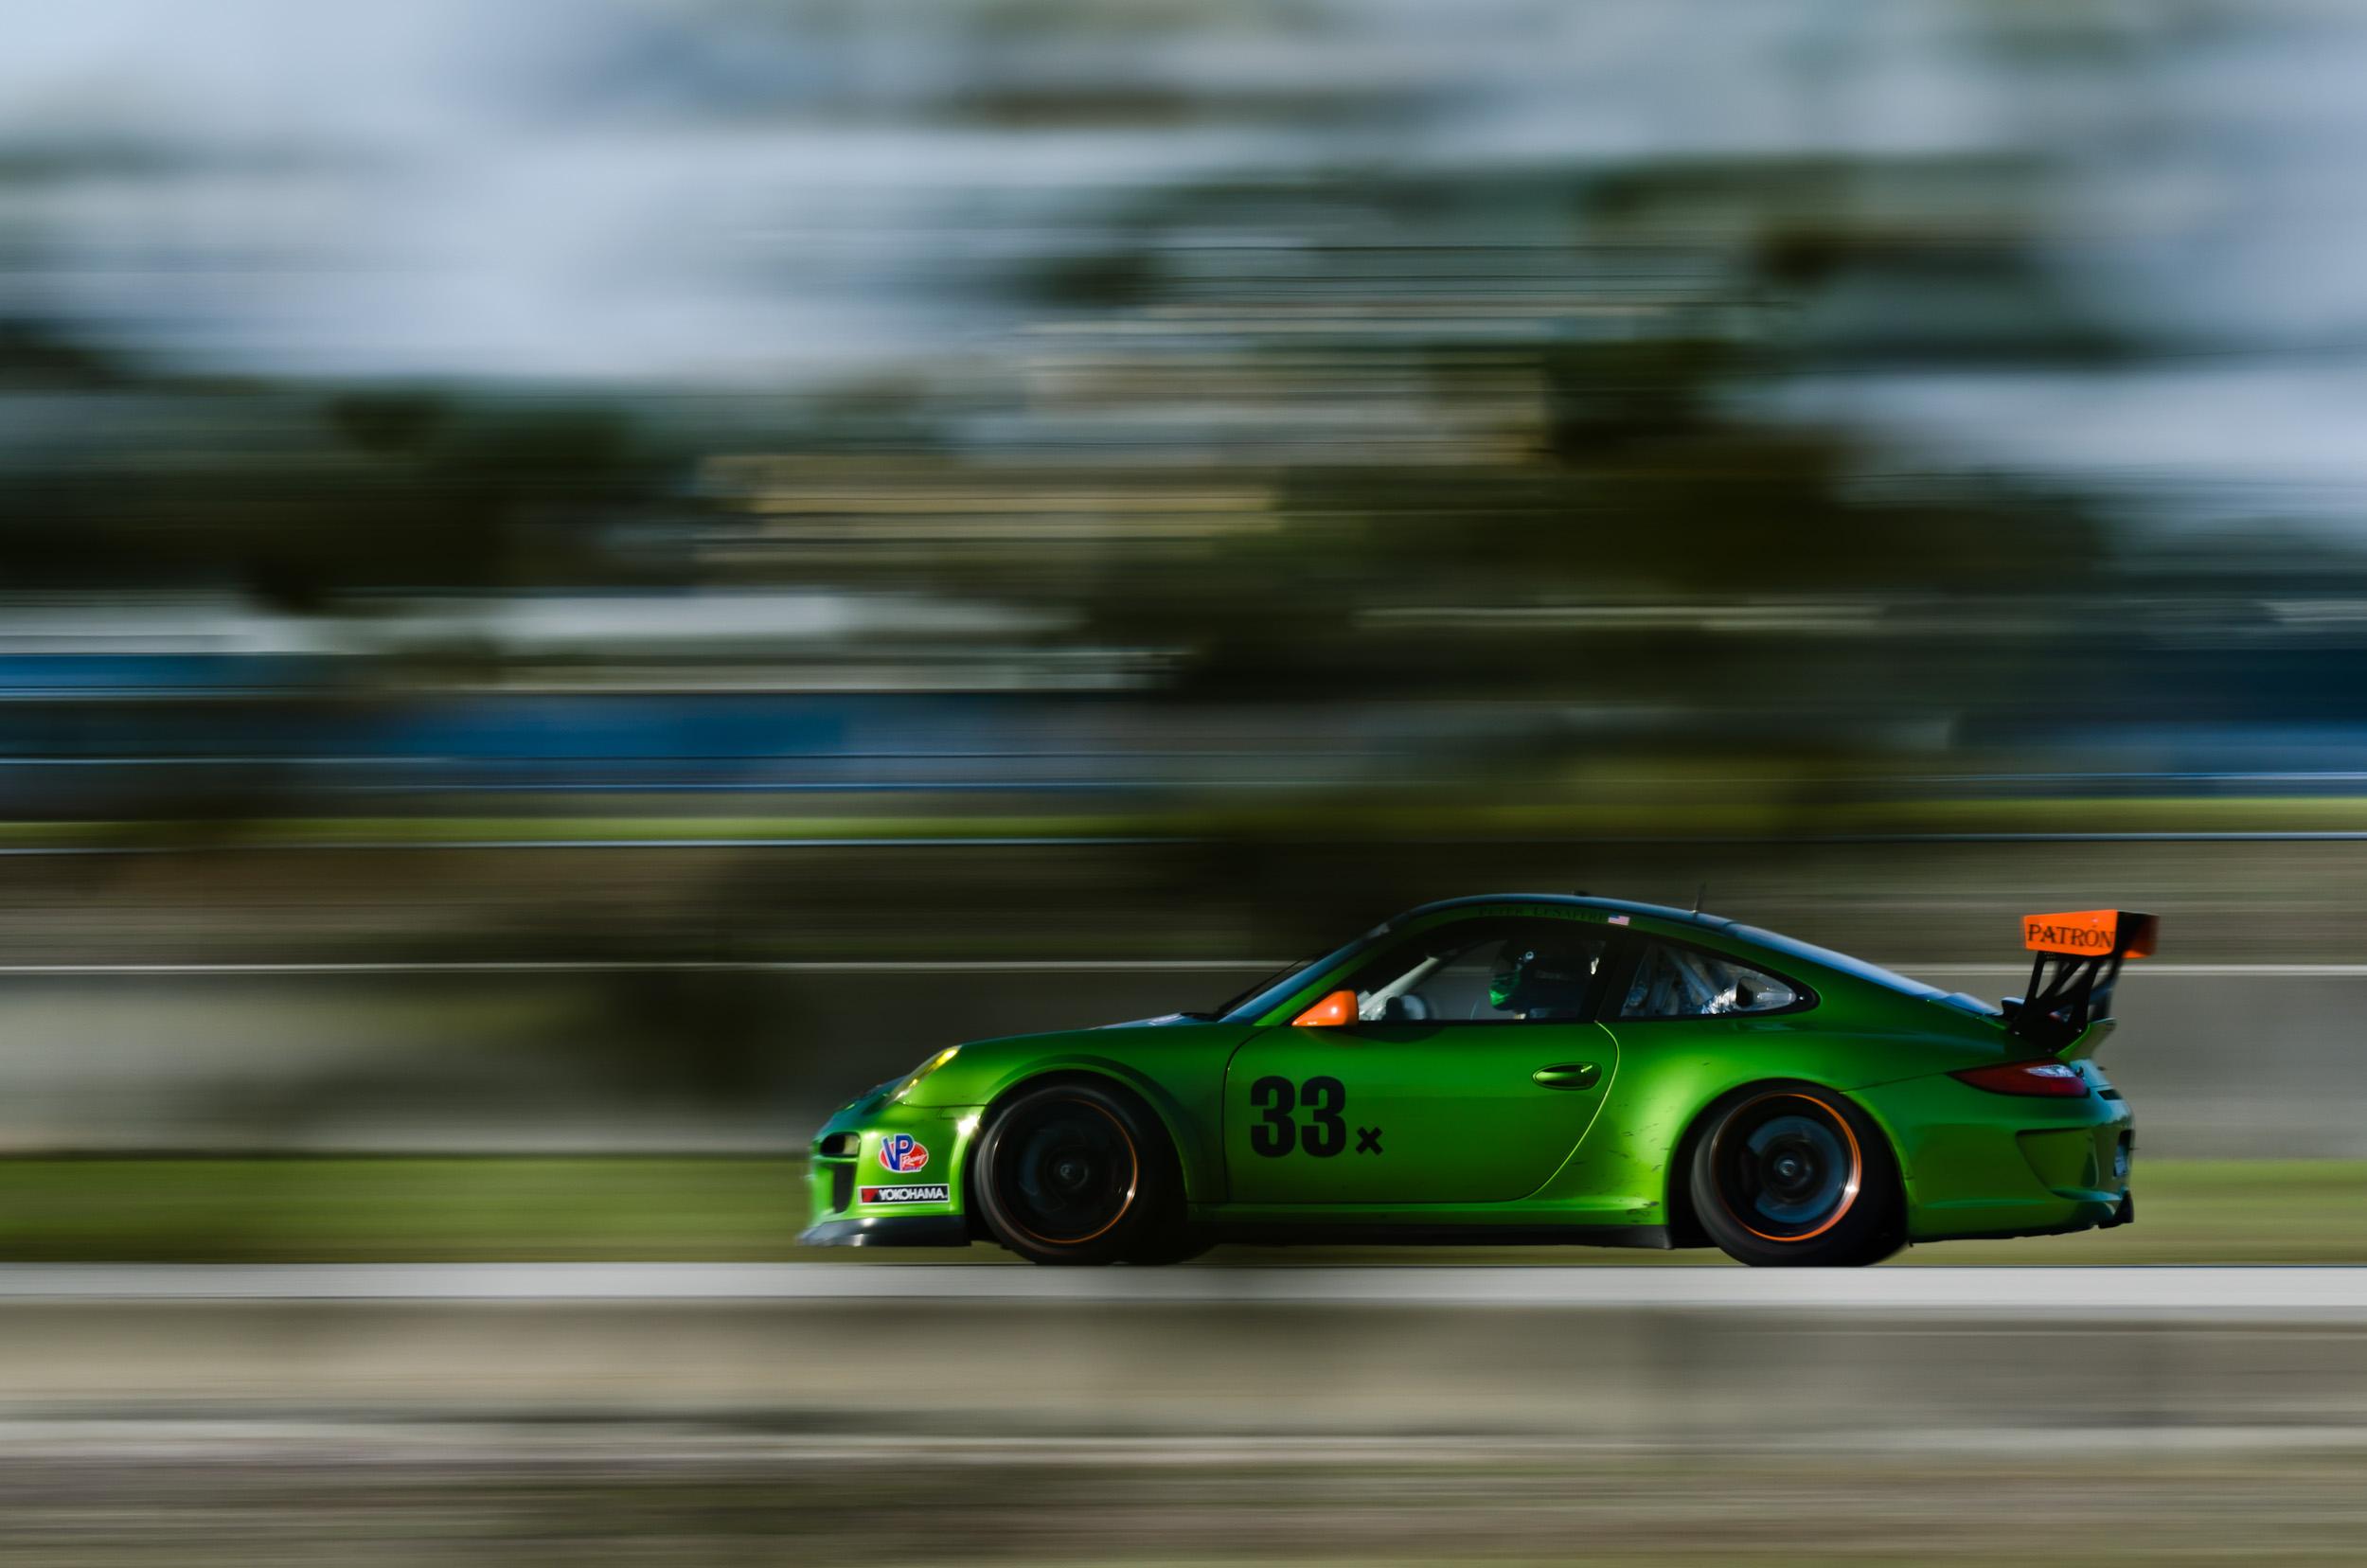 Sebring 2011 - ALMS / ILMC Winter Test - Kelly Moss Motorsports Porsche 911 GT3 Cup